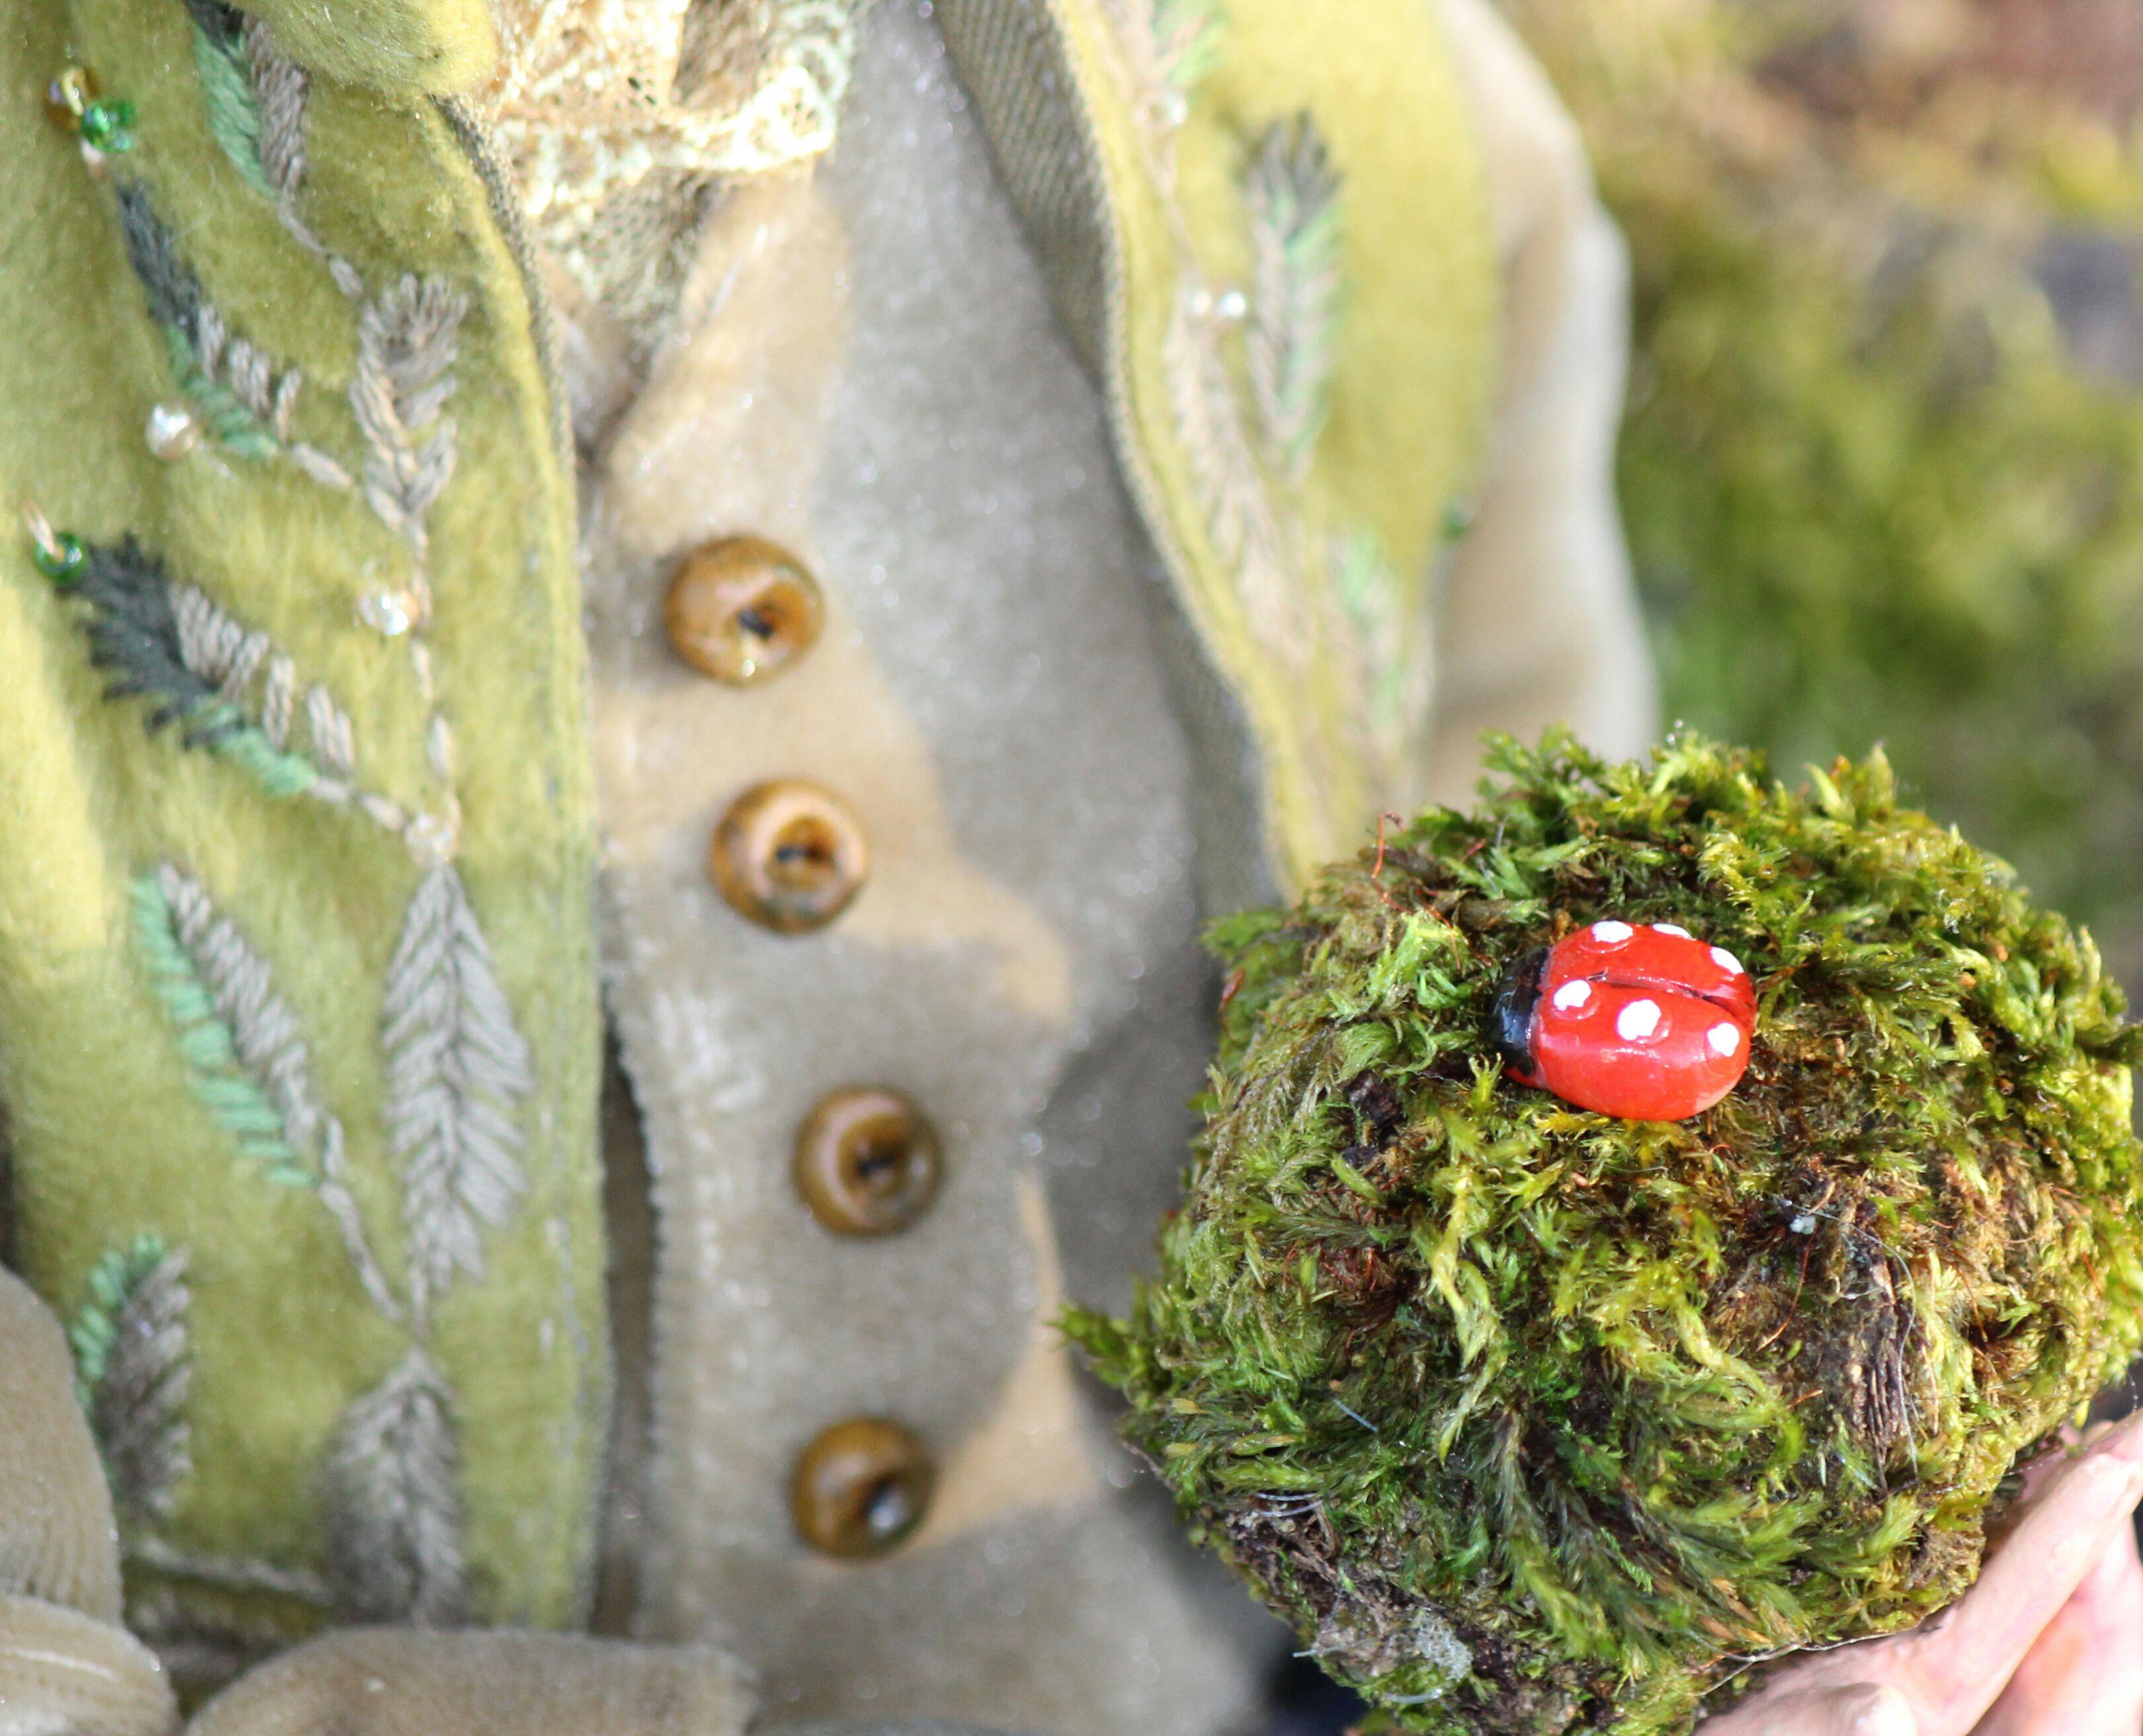 сувенир aвторскаякукла куклавподарок кукла doll авторскаякукла